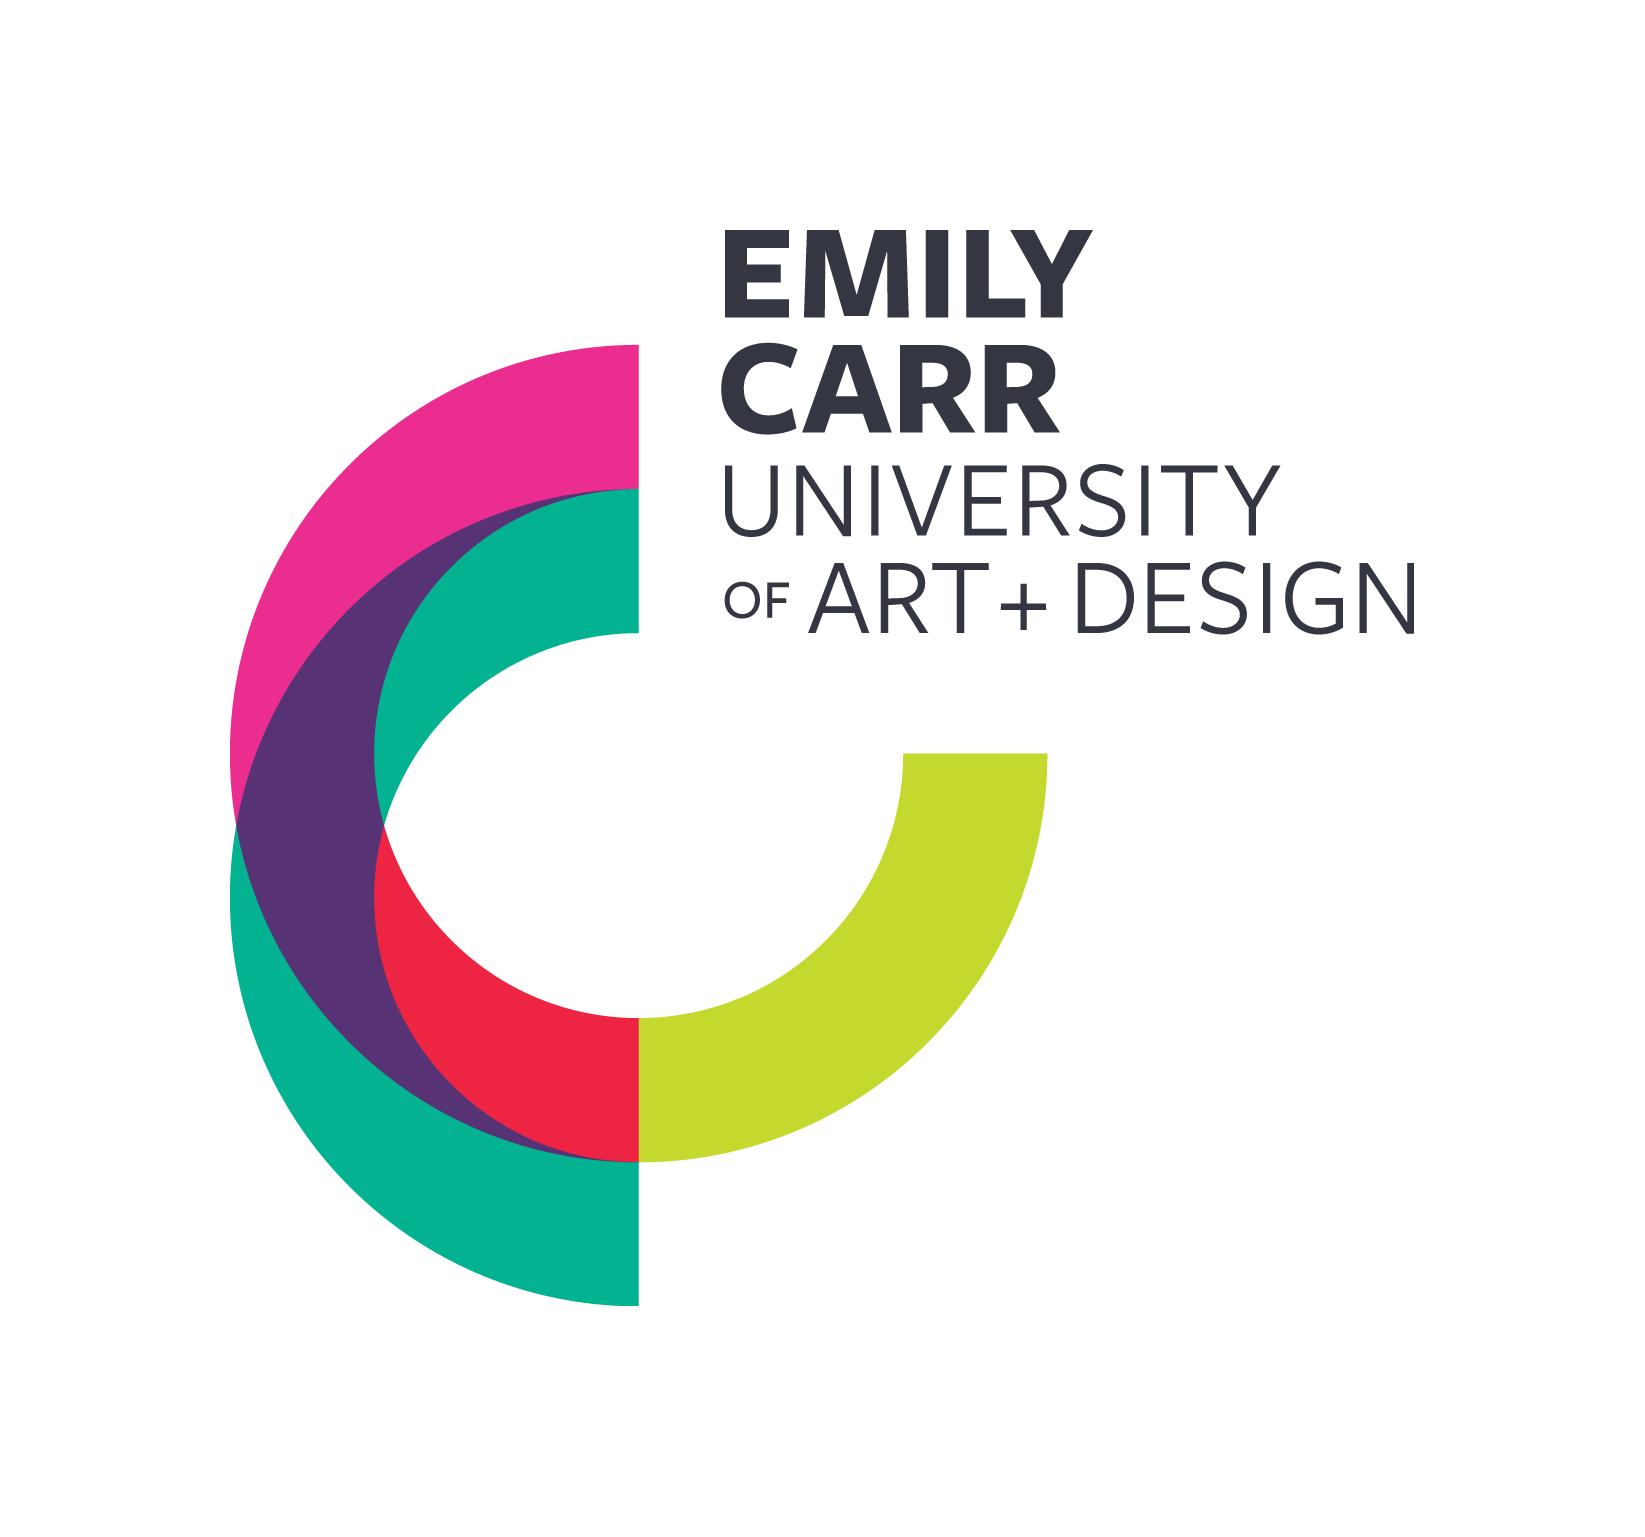 carr emily university rgb ecuad graphic lockup 4c logos vancouver primary gdc jobs pdf fpo arts supporters vanarts conundrum cities